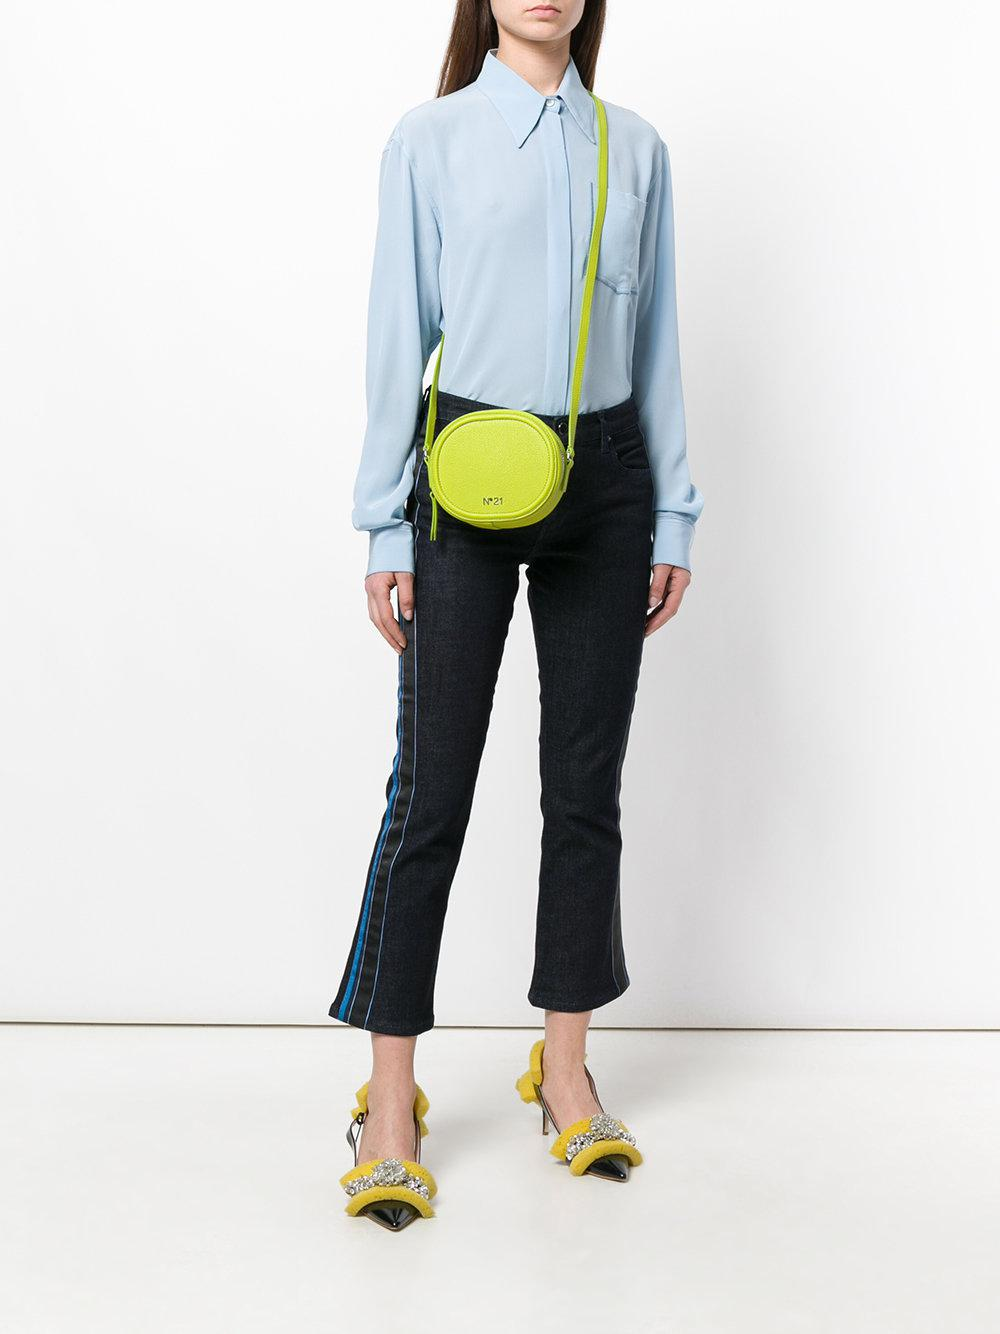 N°21 Leather Circle Cross-body Bag in Green